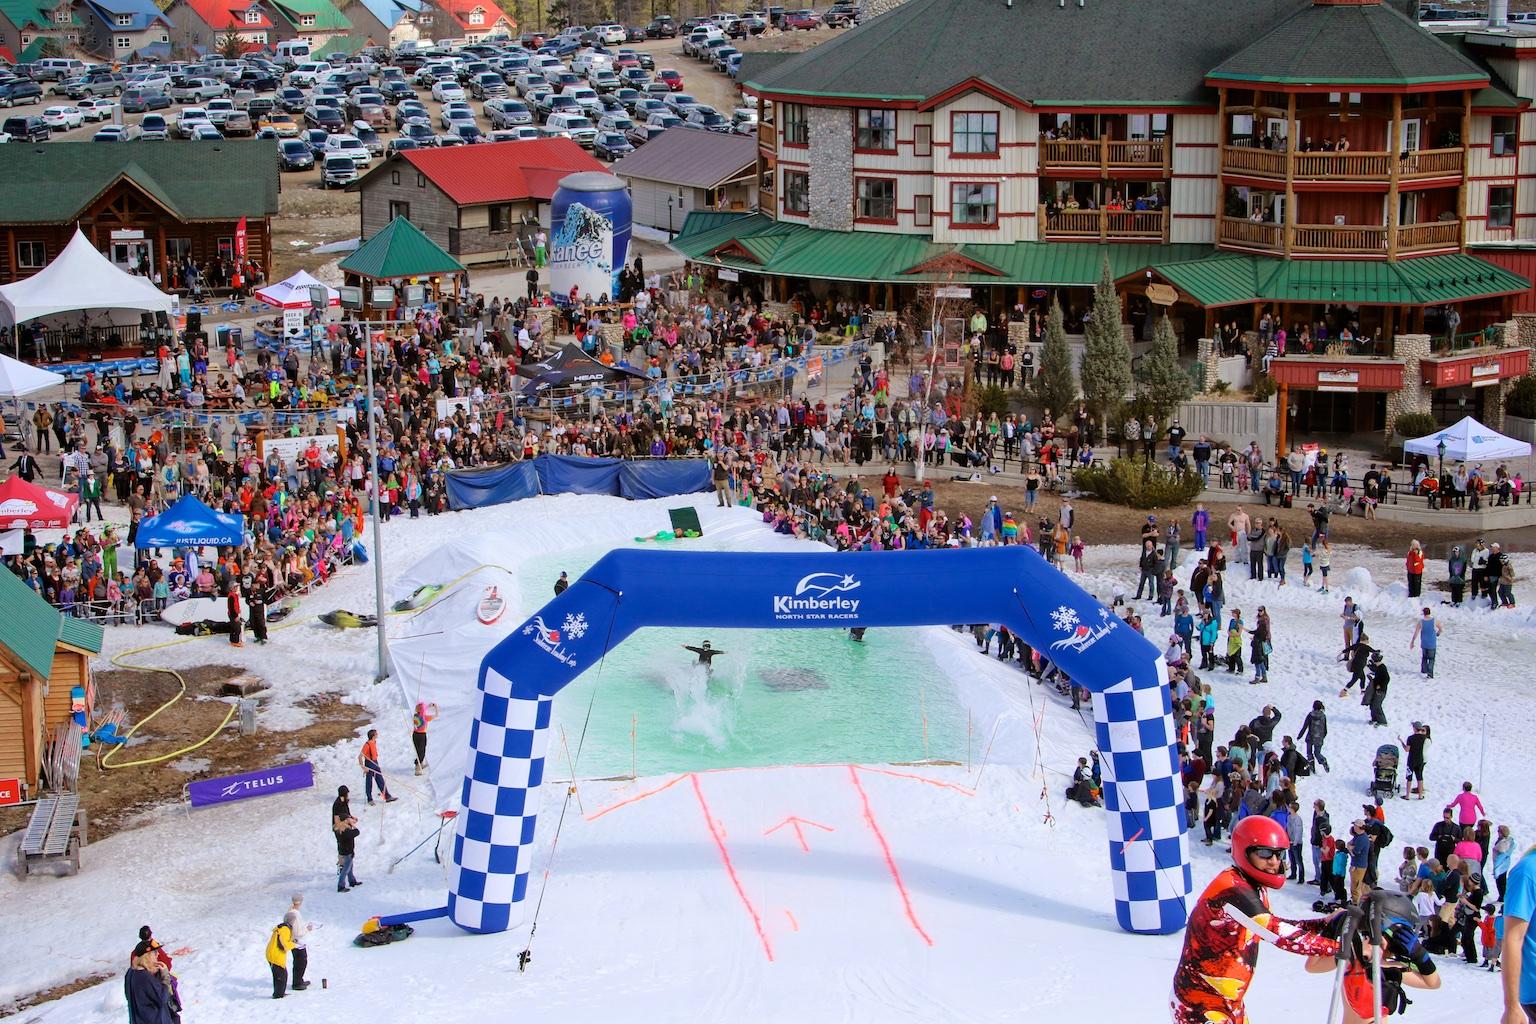 Kimberley, Panorama ski resorts set for final weekend